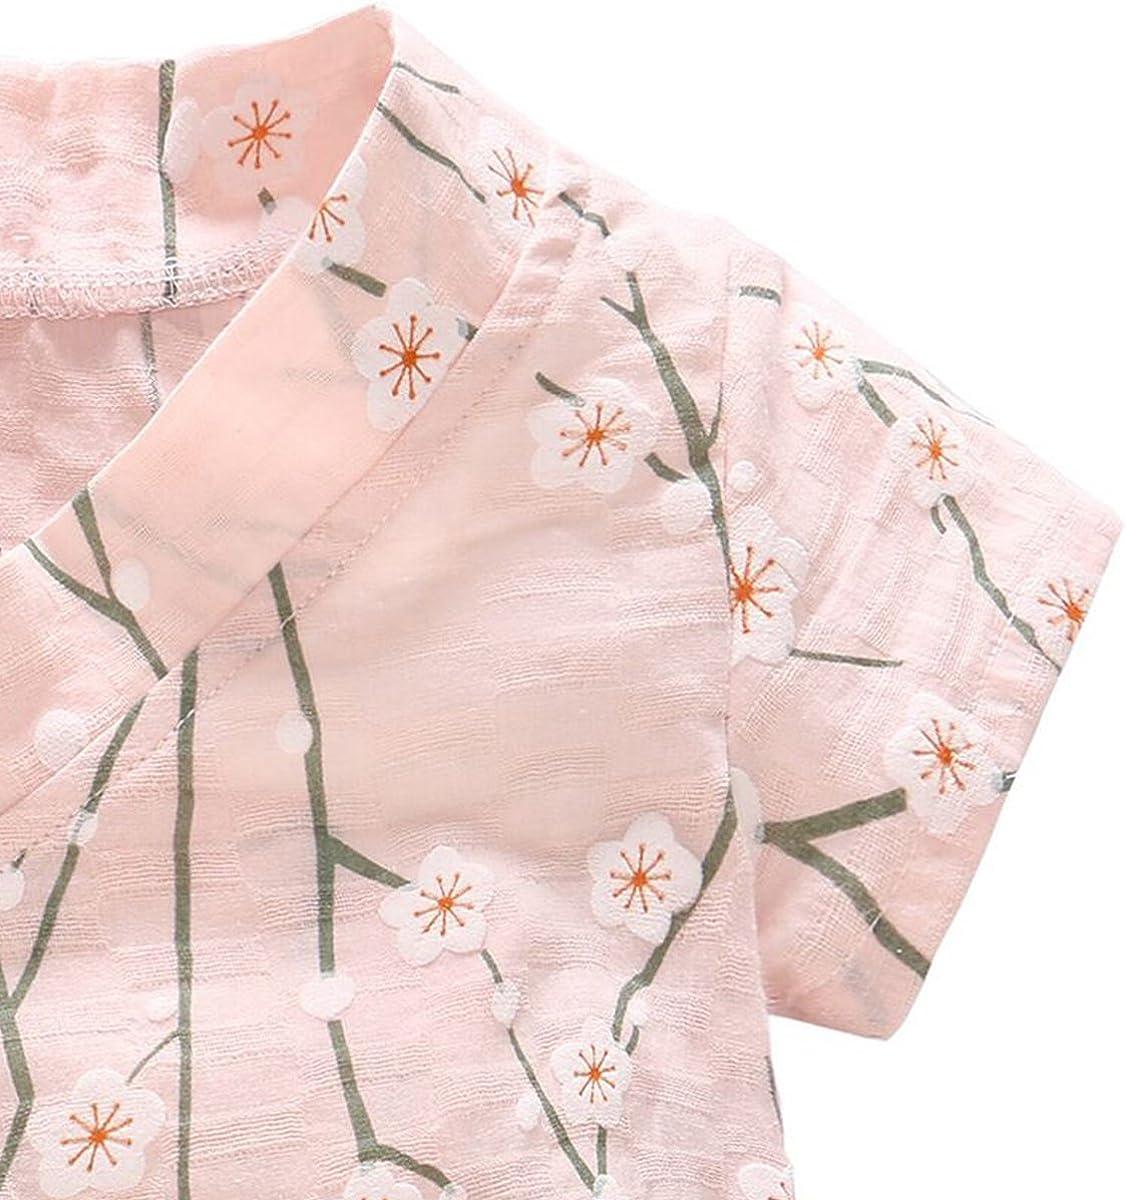 DGAGA Newborn Baby Kimono Robe Organic Cotton Infant Short Sleeve Romper Pajamas